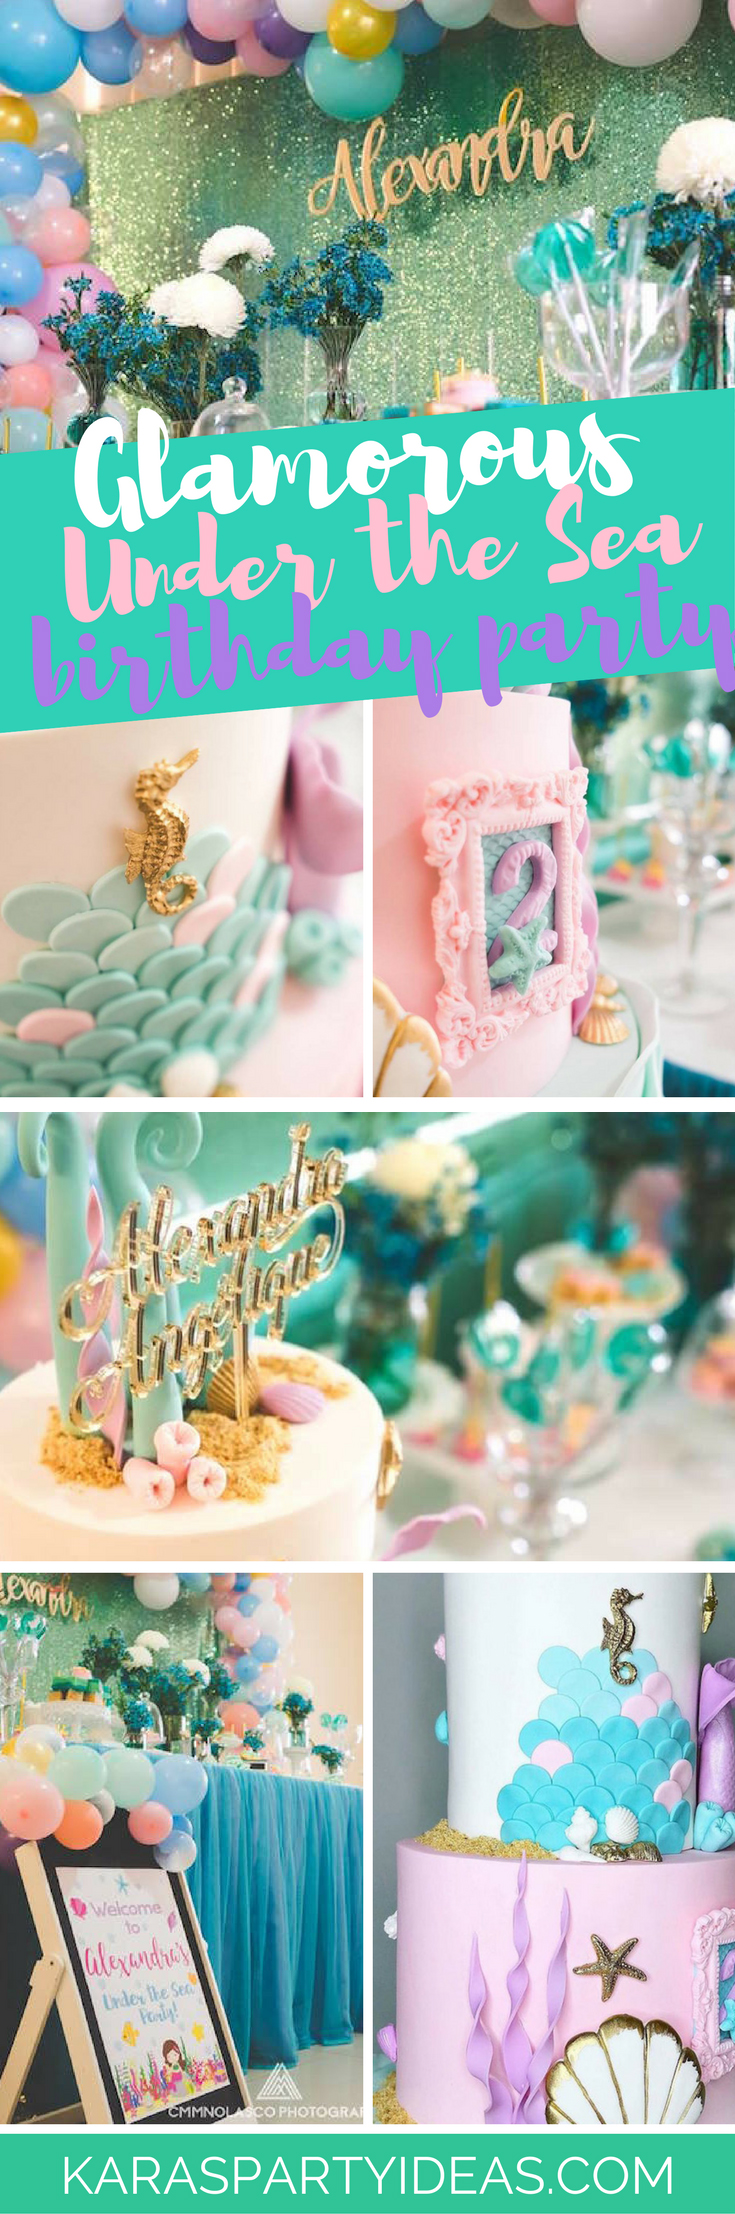 Glamorous Under the Sea Birthday Party via Kara's Party Ideas -KarasPartyIdeas.com